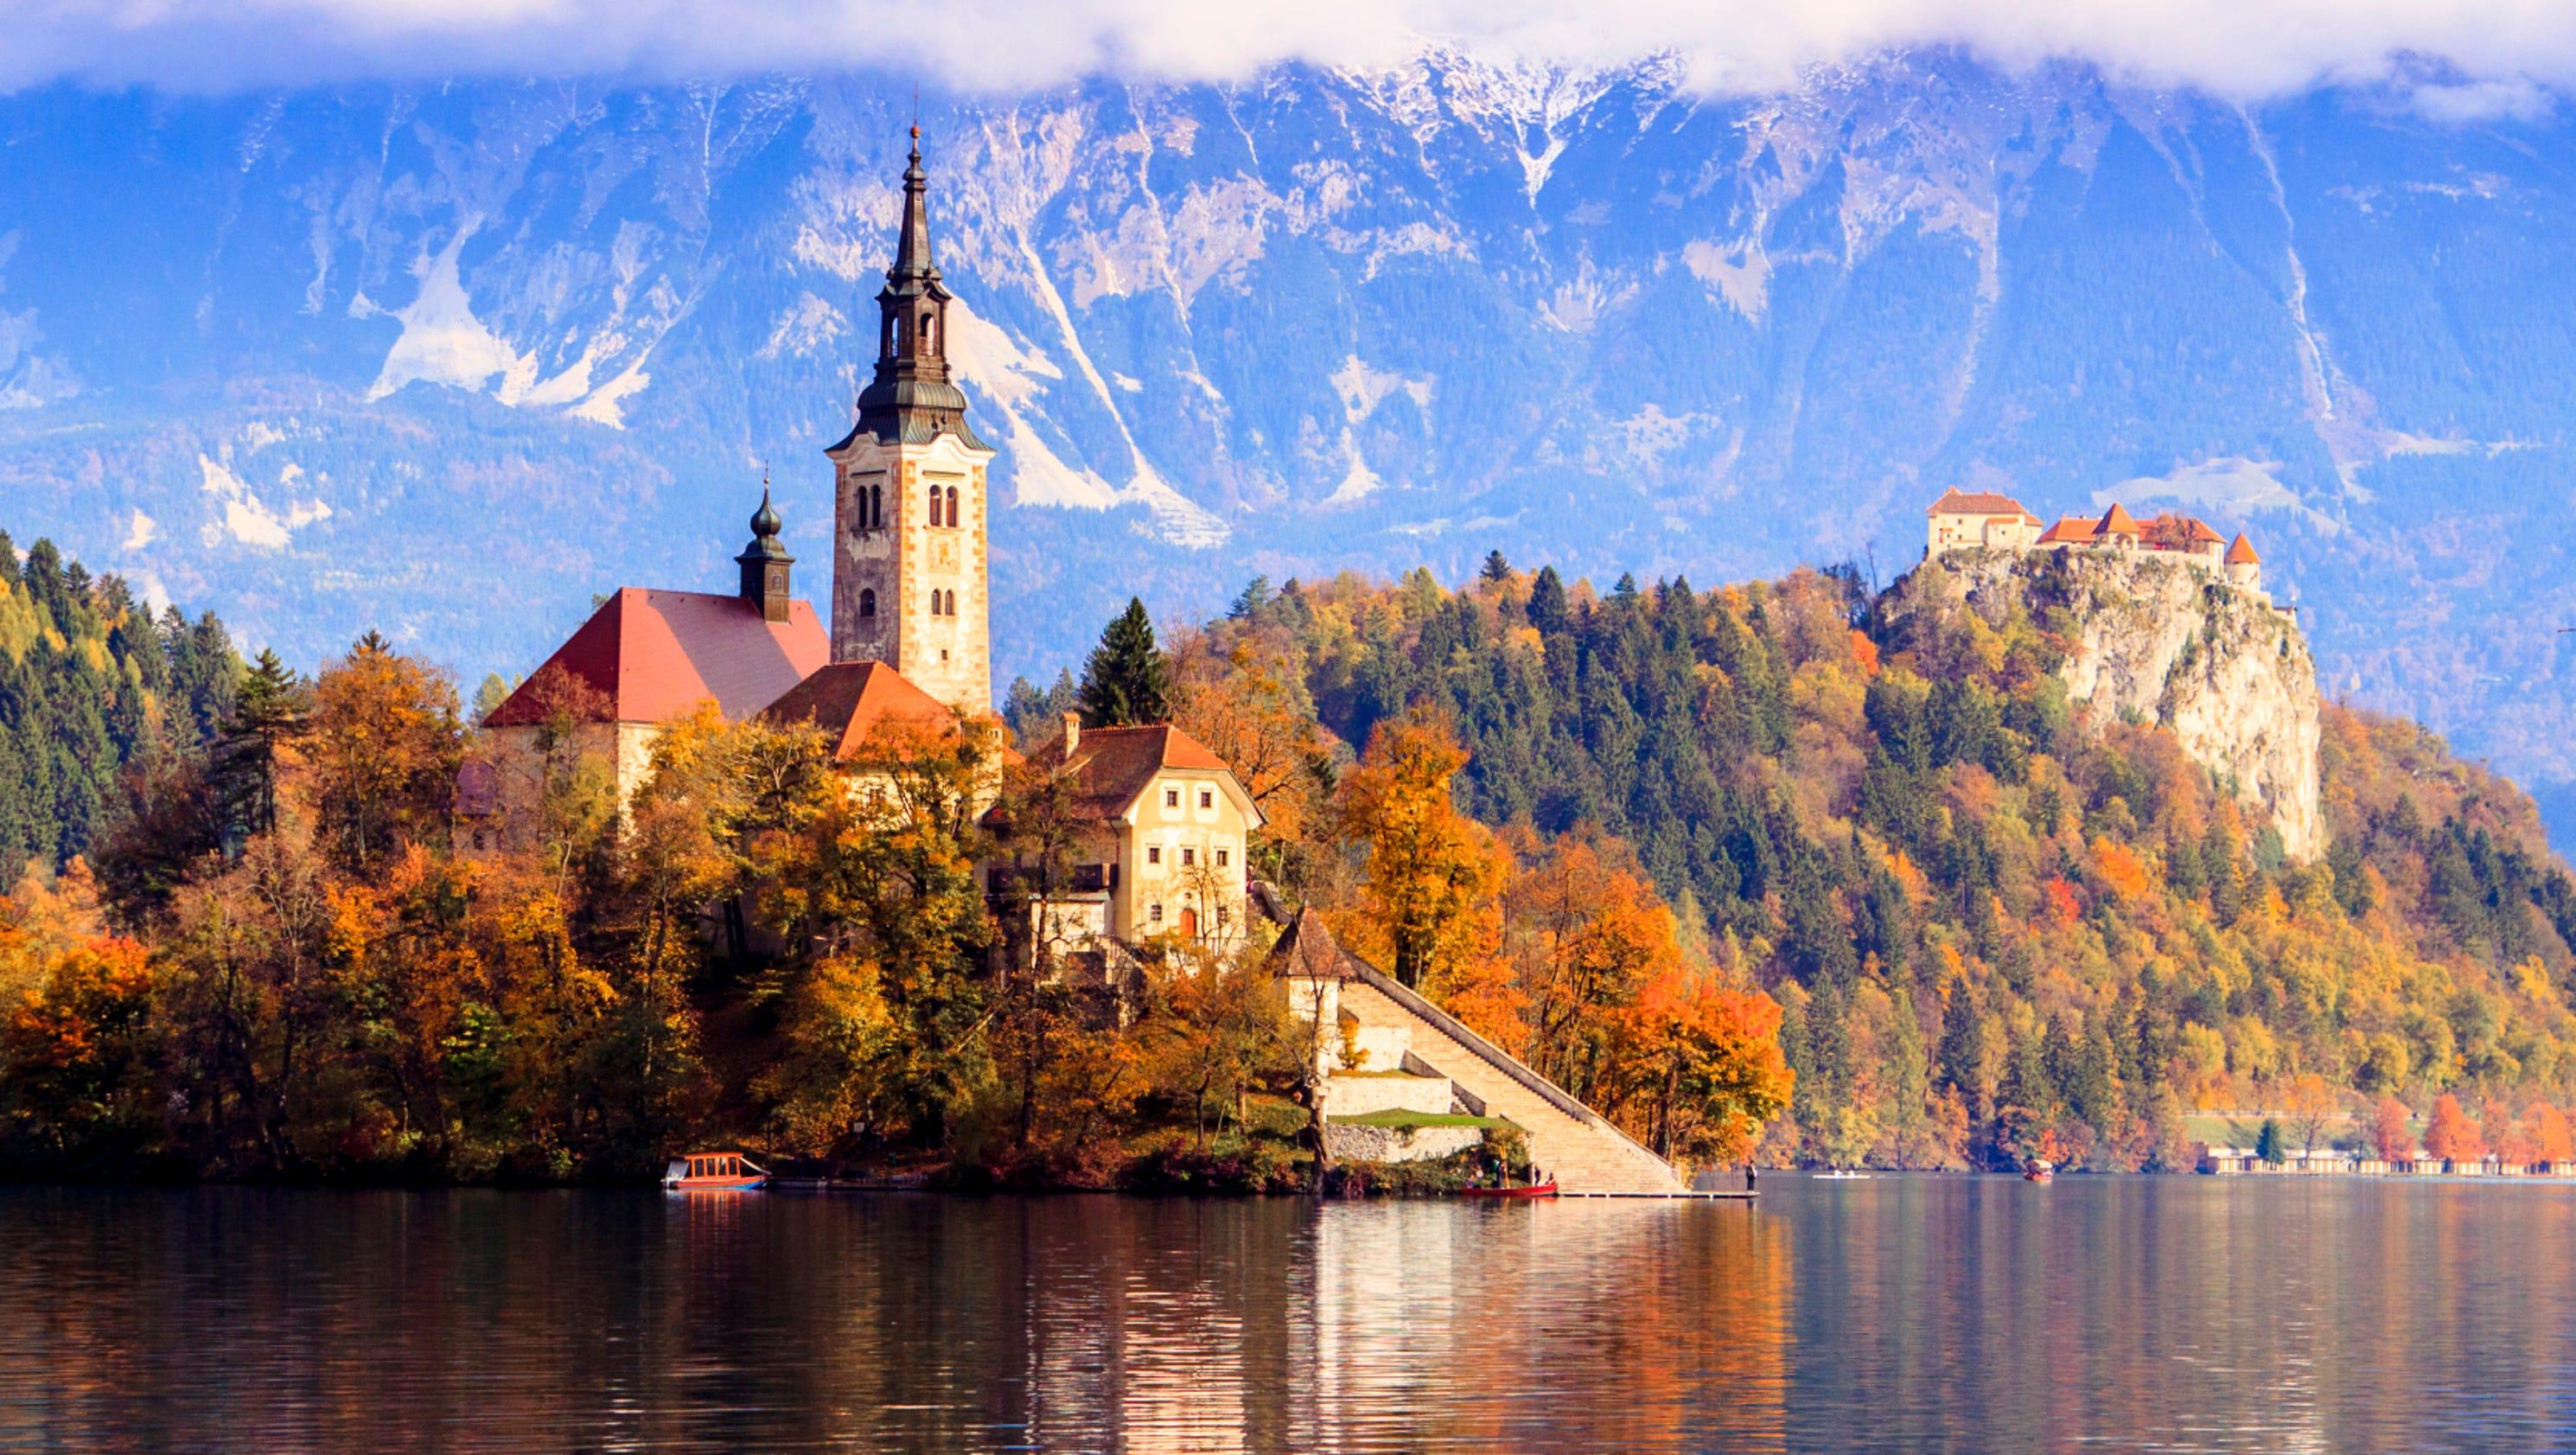 Worlds Beautiful Houses: Beautiful Churches Around The World